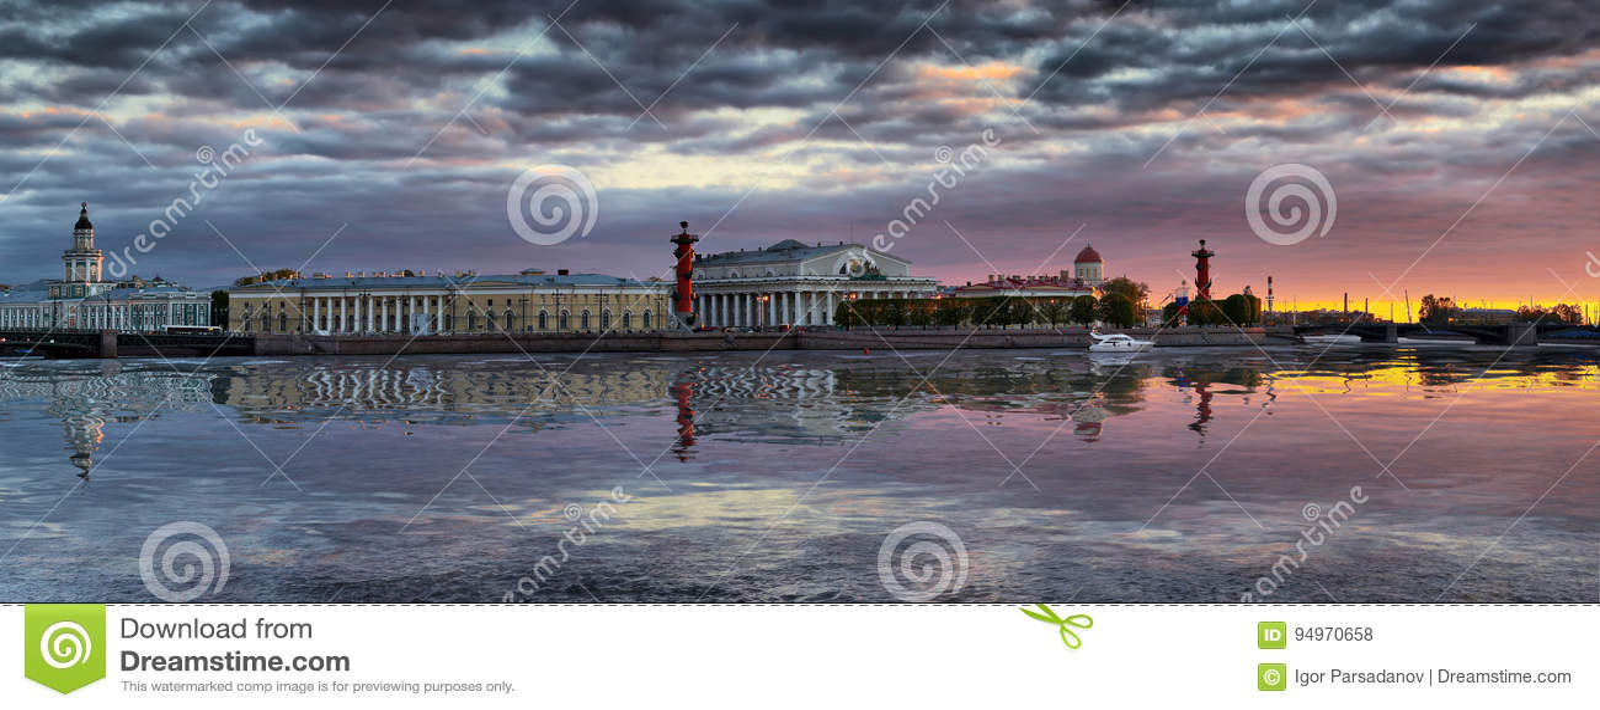 Panorama do cuspe de Vasilyevsky Island em St Petersburg